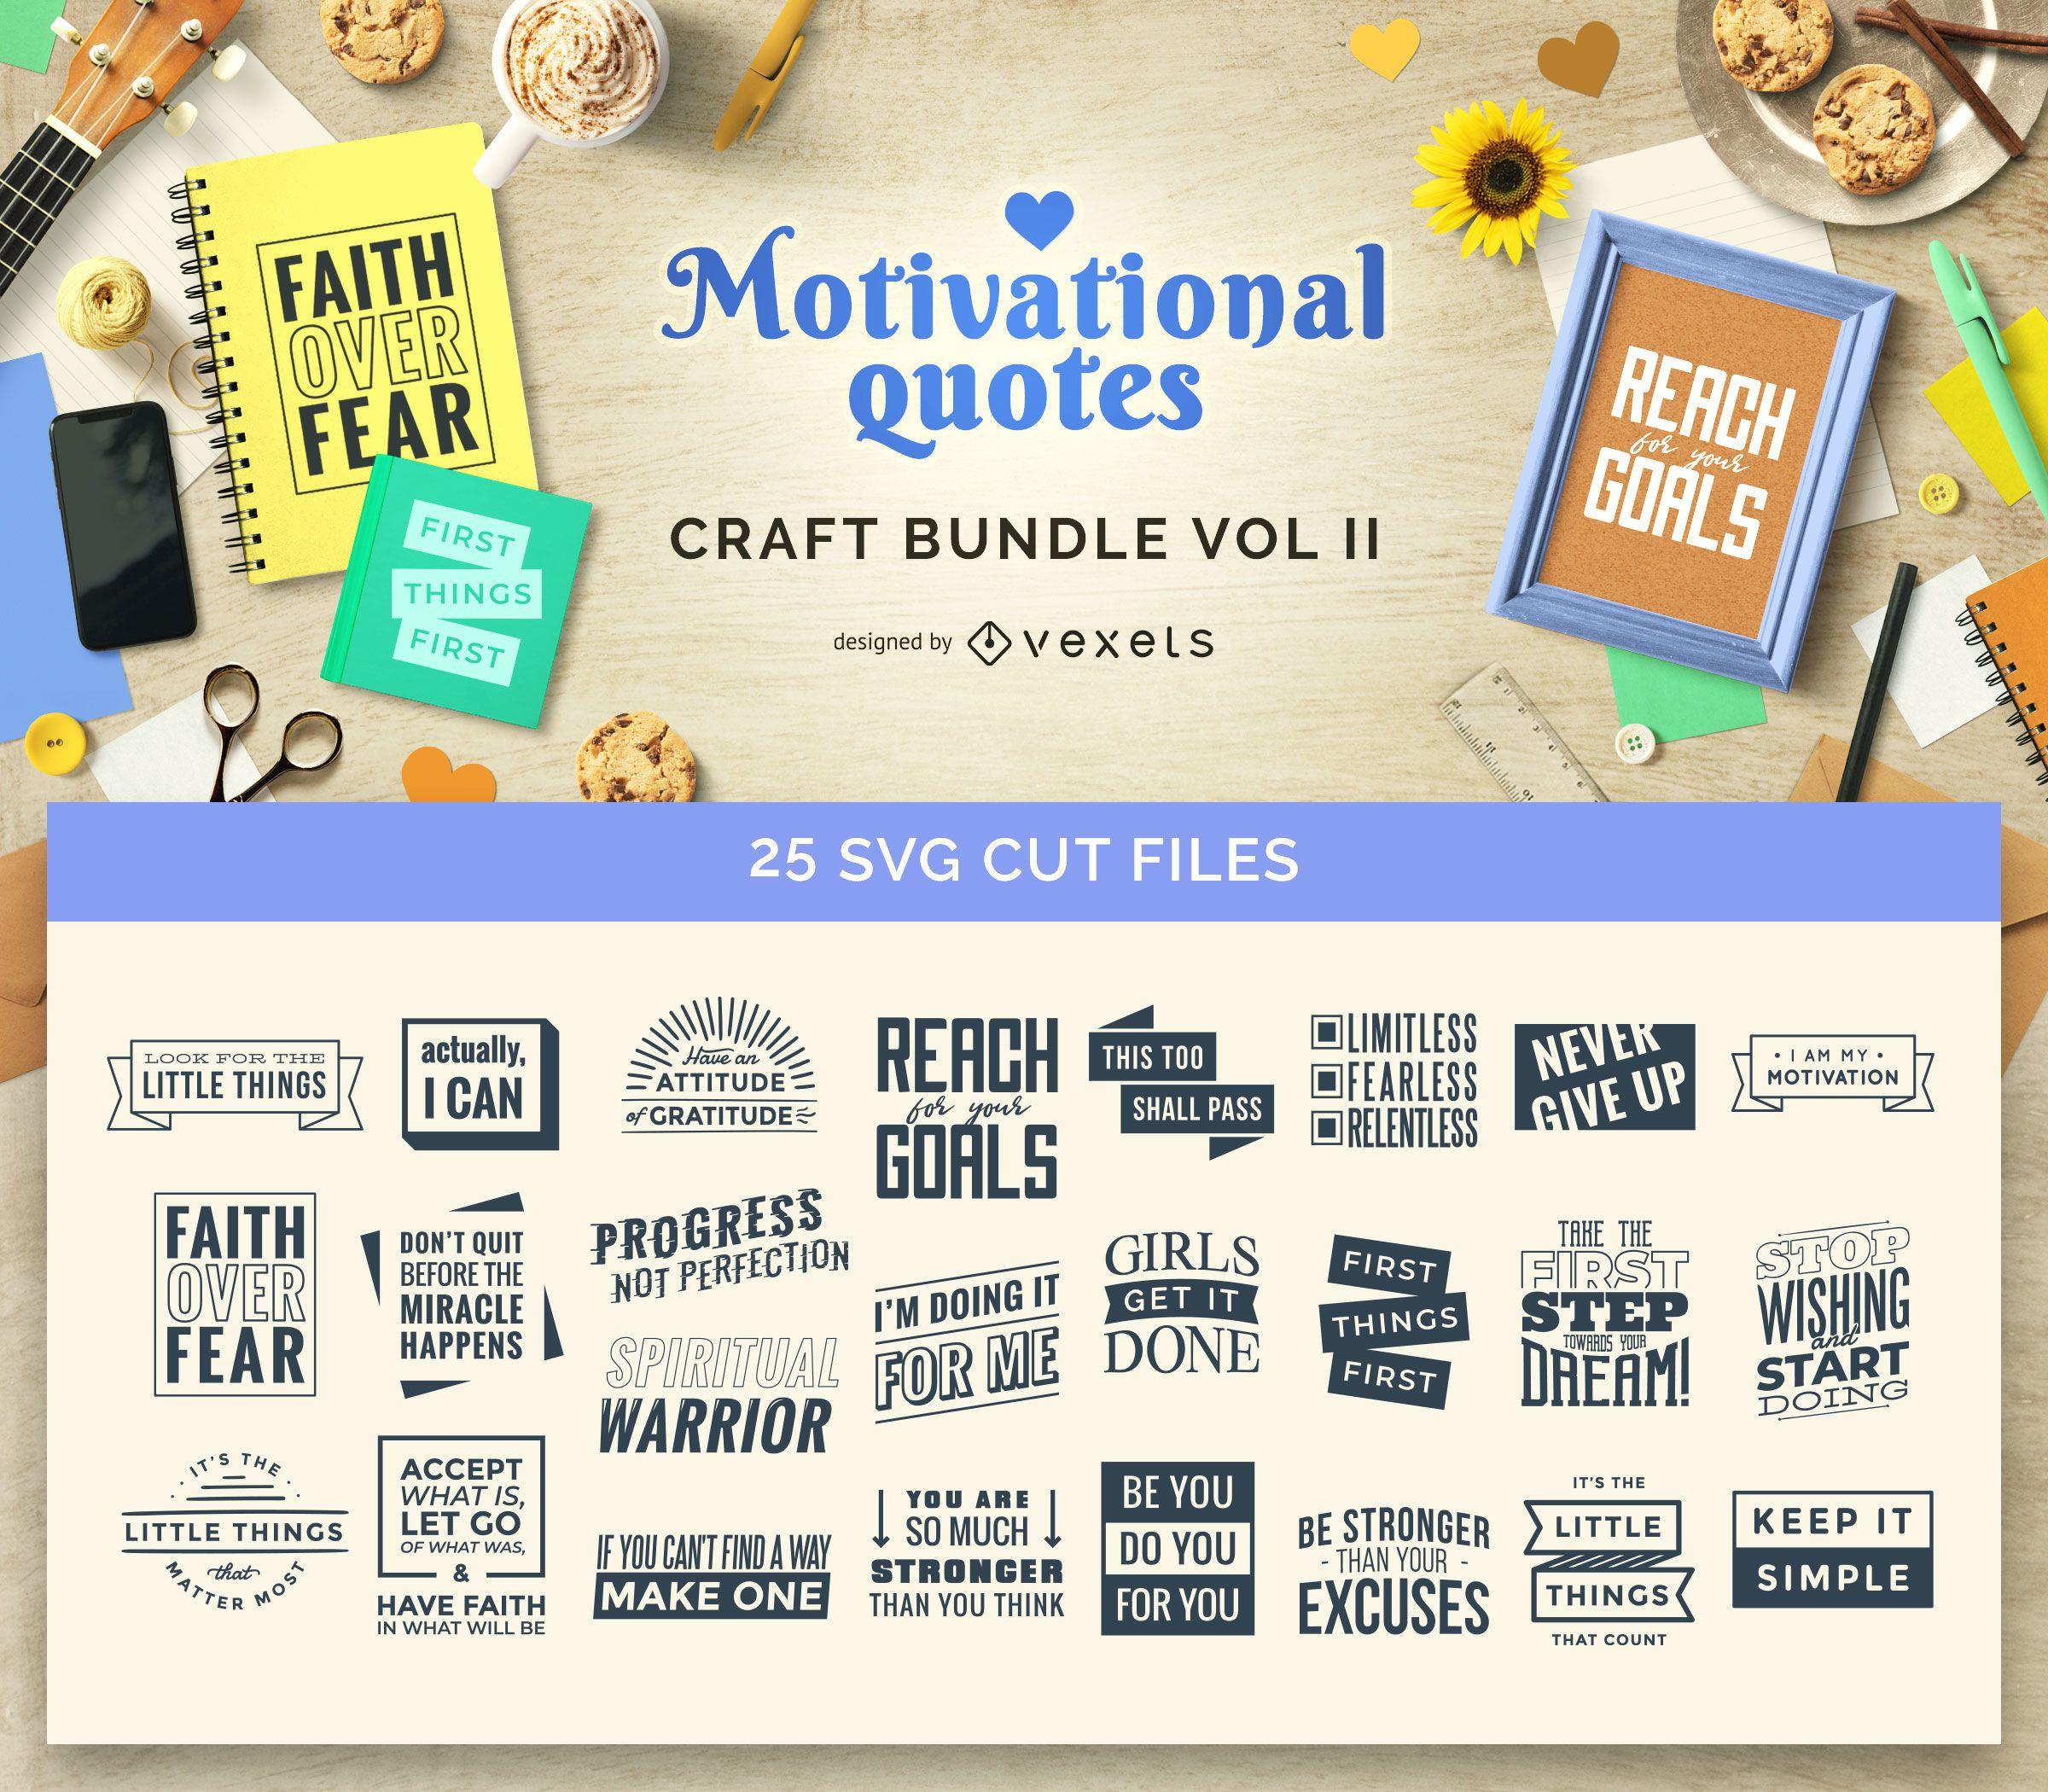 Motivational Quotes Craft Bundle Vol II